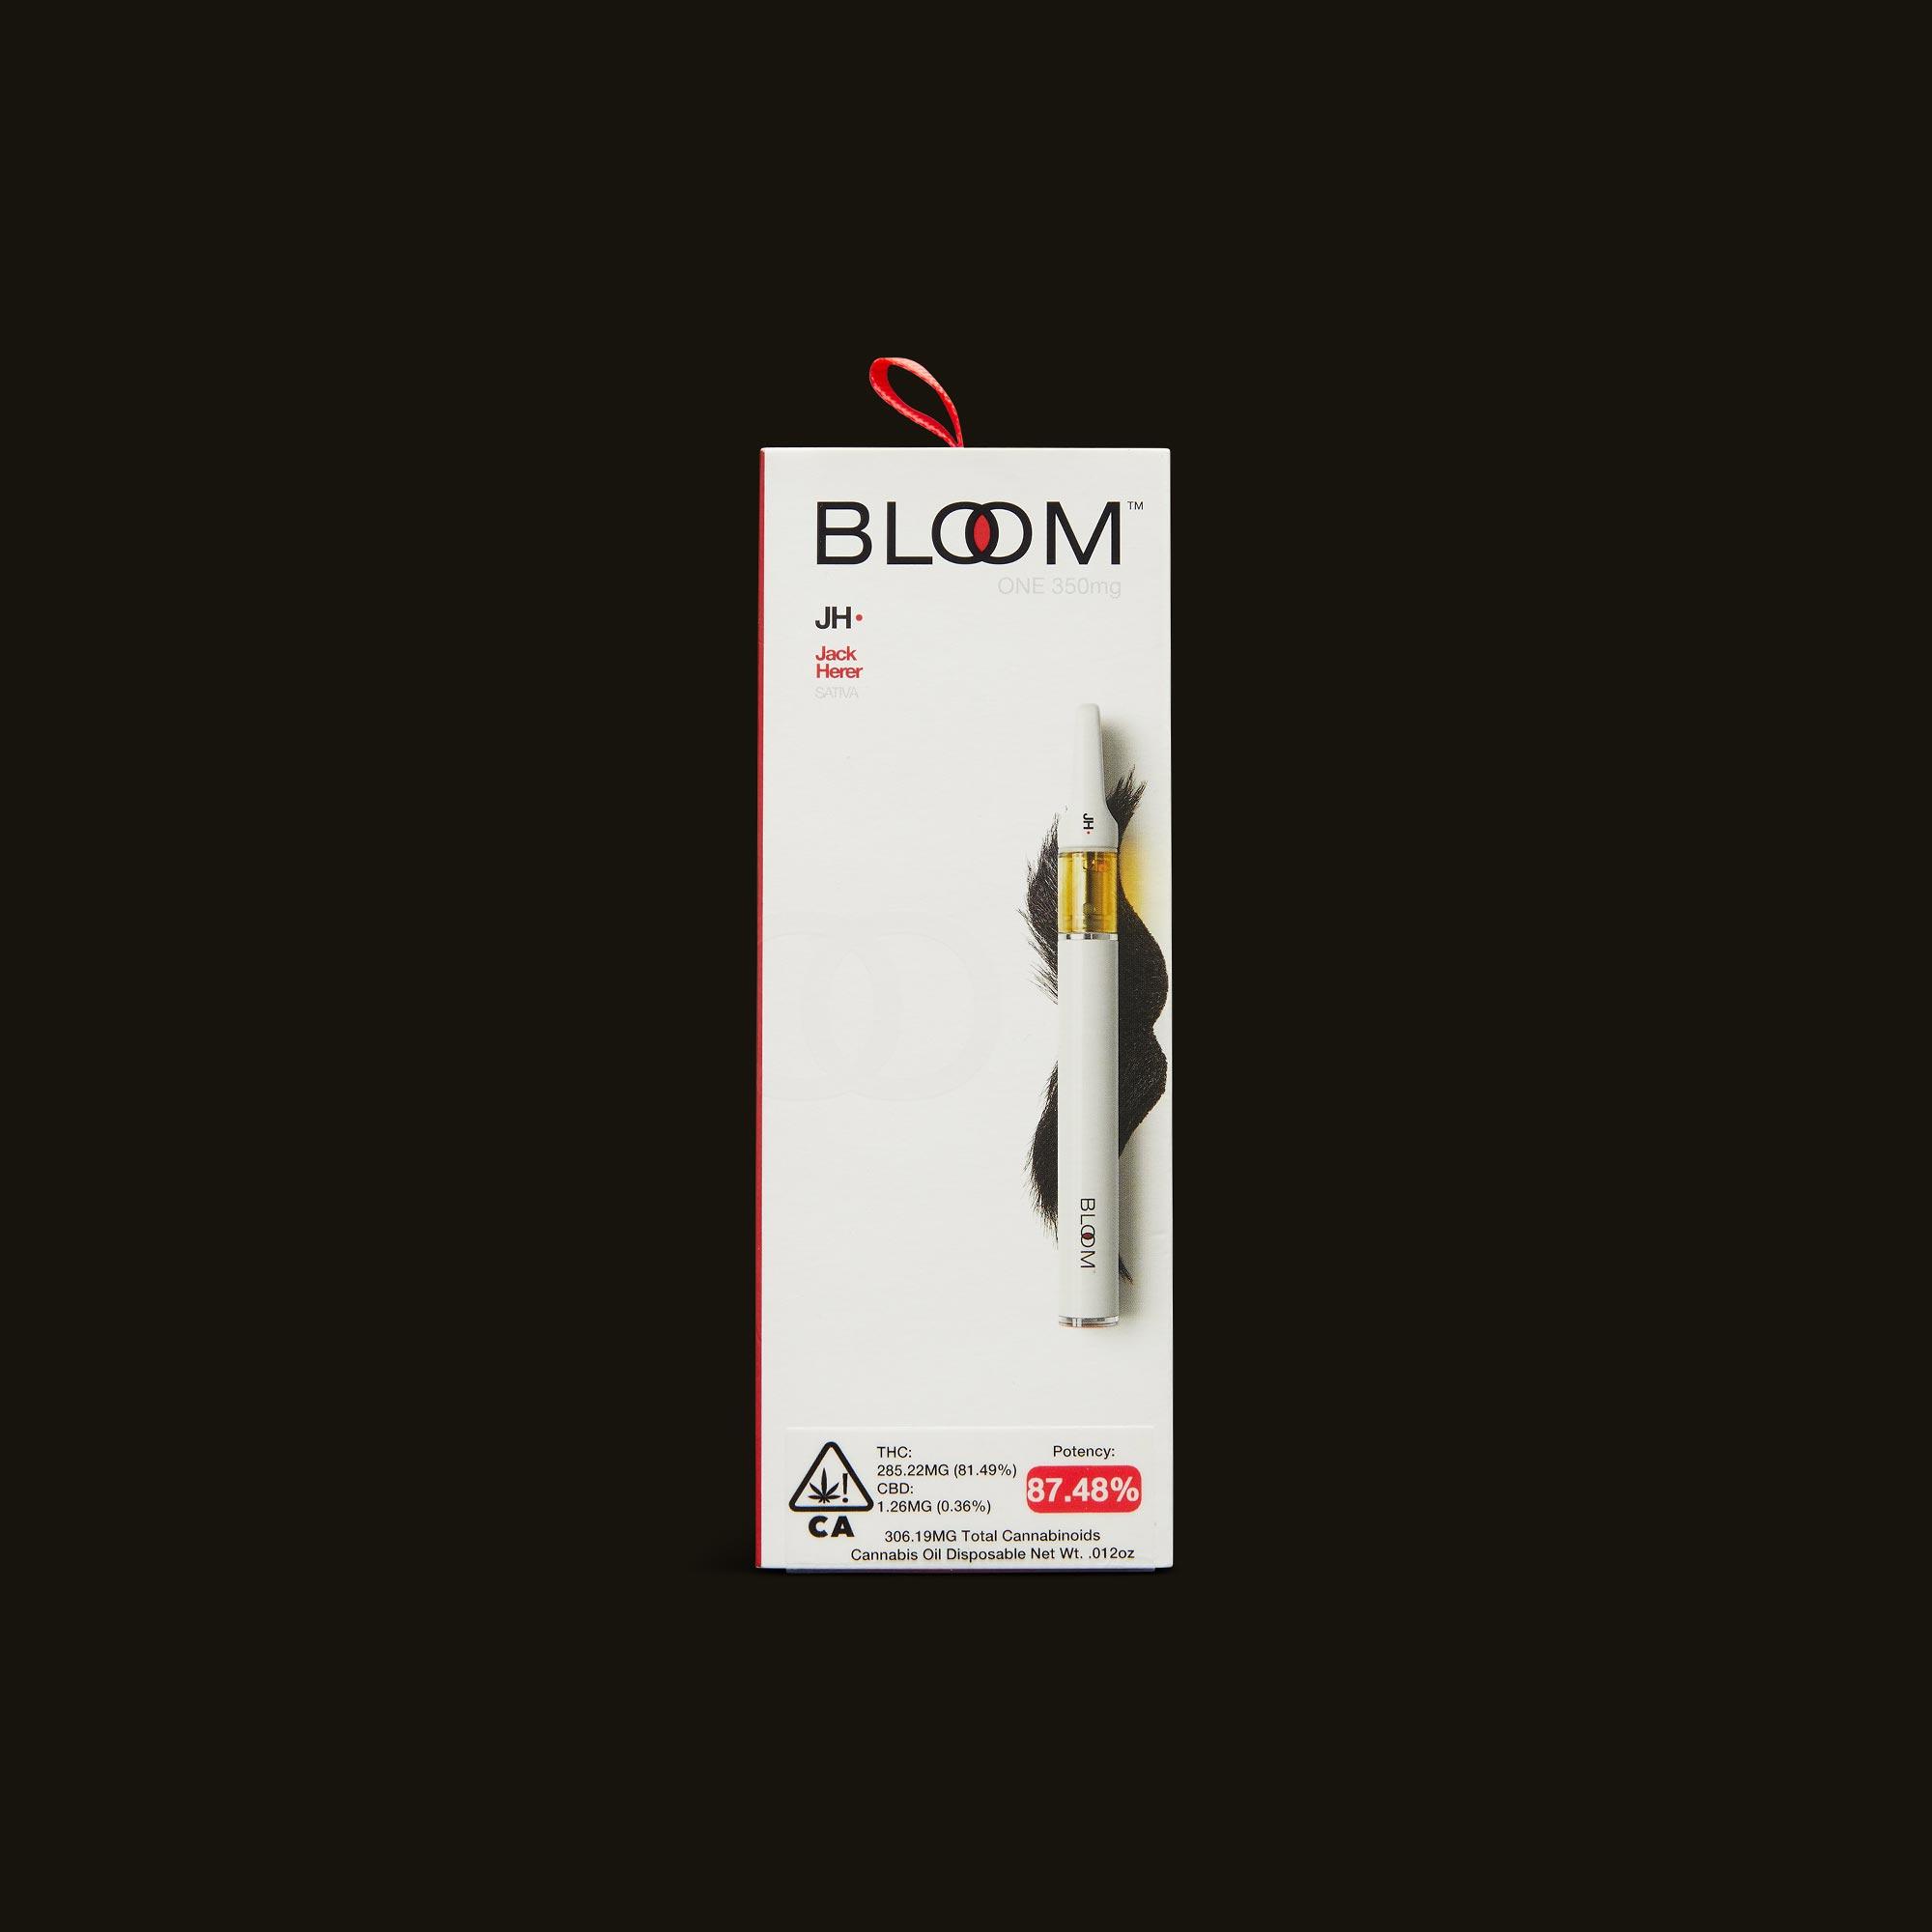 Bloom Jack Herer Bloom One Front Packaging